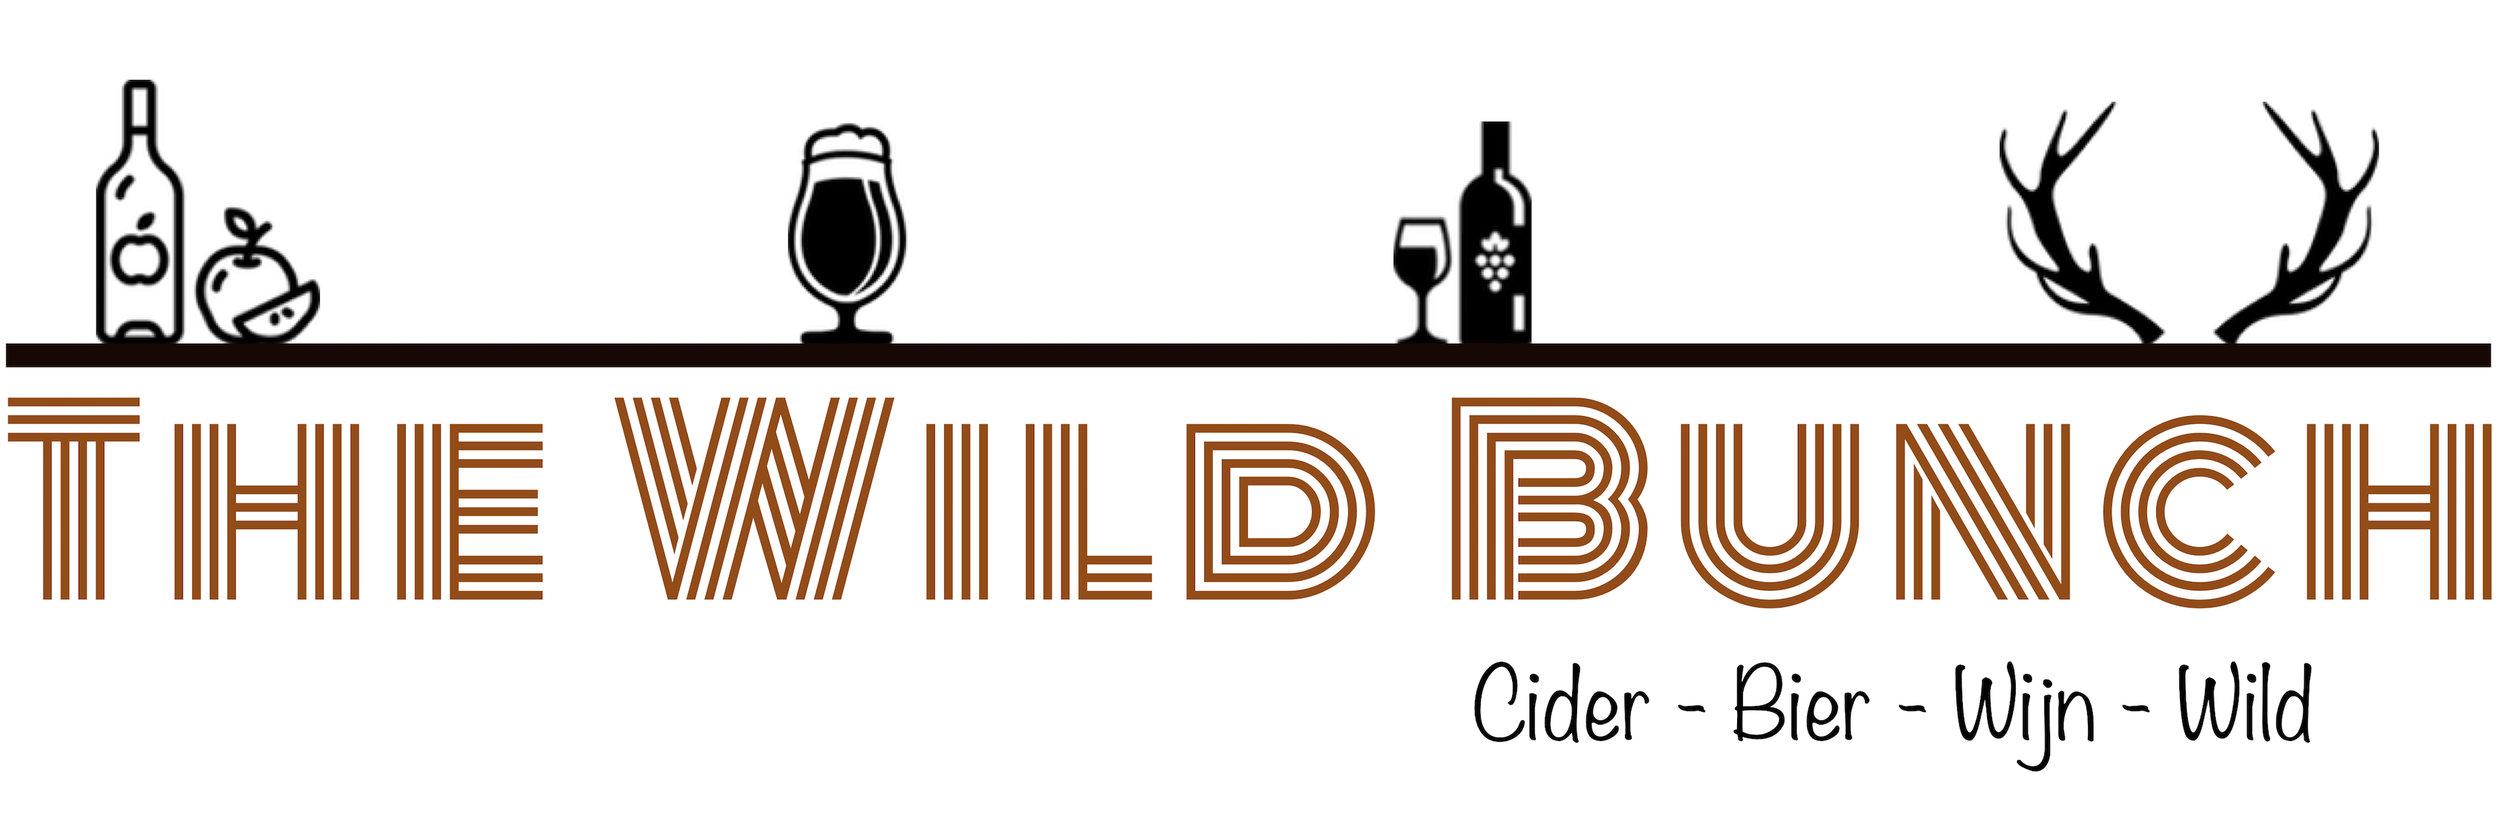 The Wild Bunch: Ciderwinkel.nl - Bierselect - De Wilde Slager - Vino Per Tutti.nl